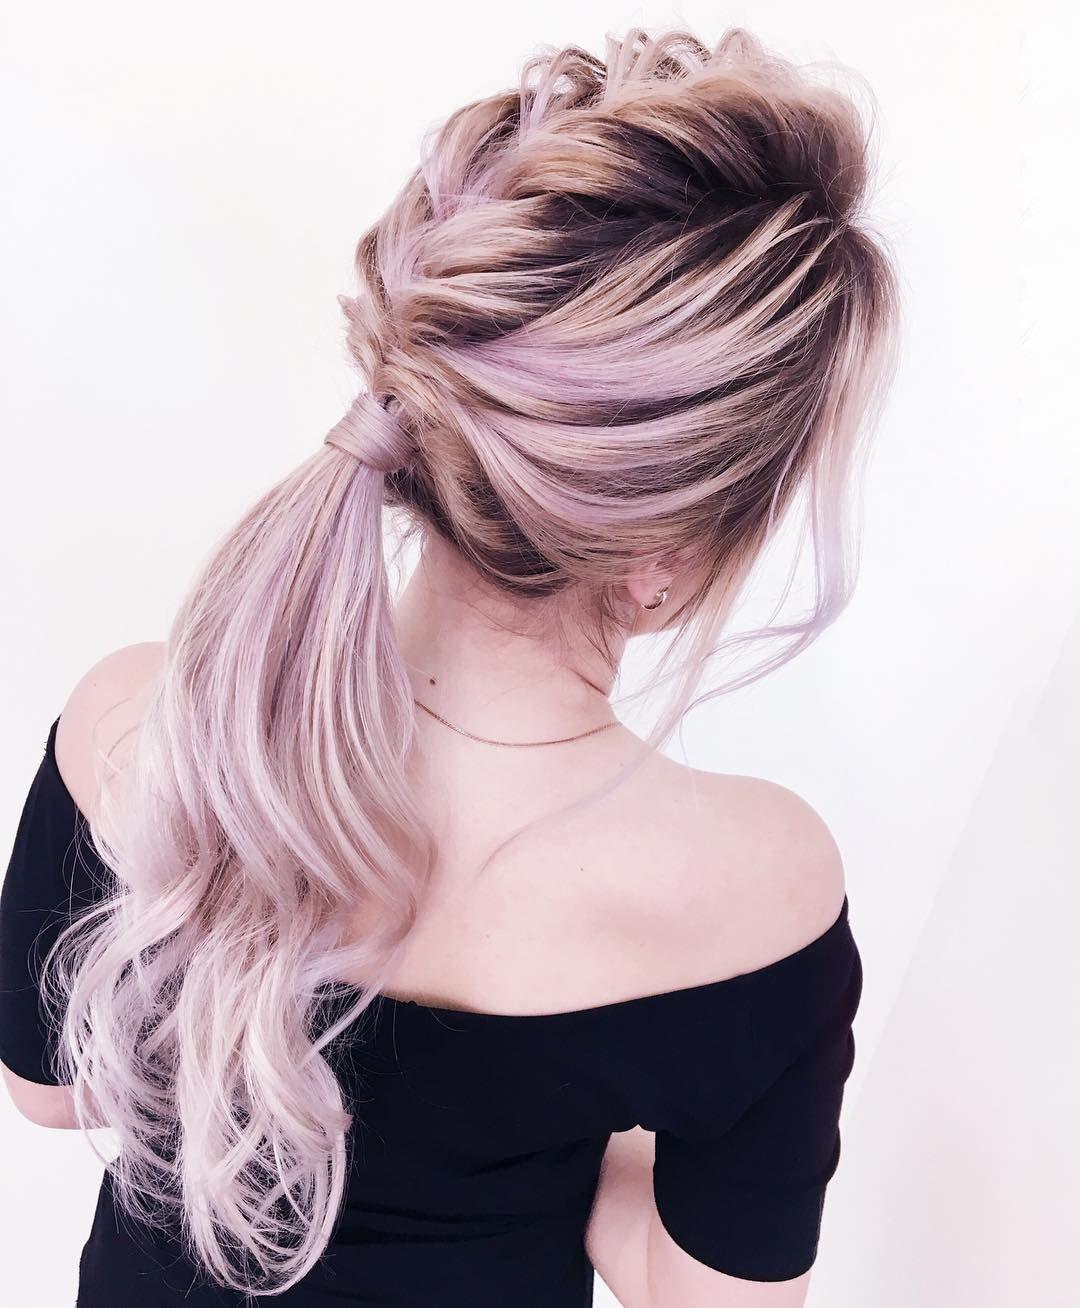 52 Beautiful hairstyle inspiration , braids ,hairstyles ,braided ponytails , textured braids #hairstyle #hair #braids #ponytails